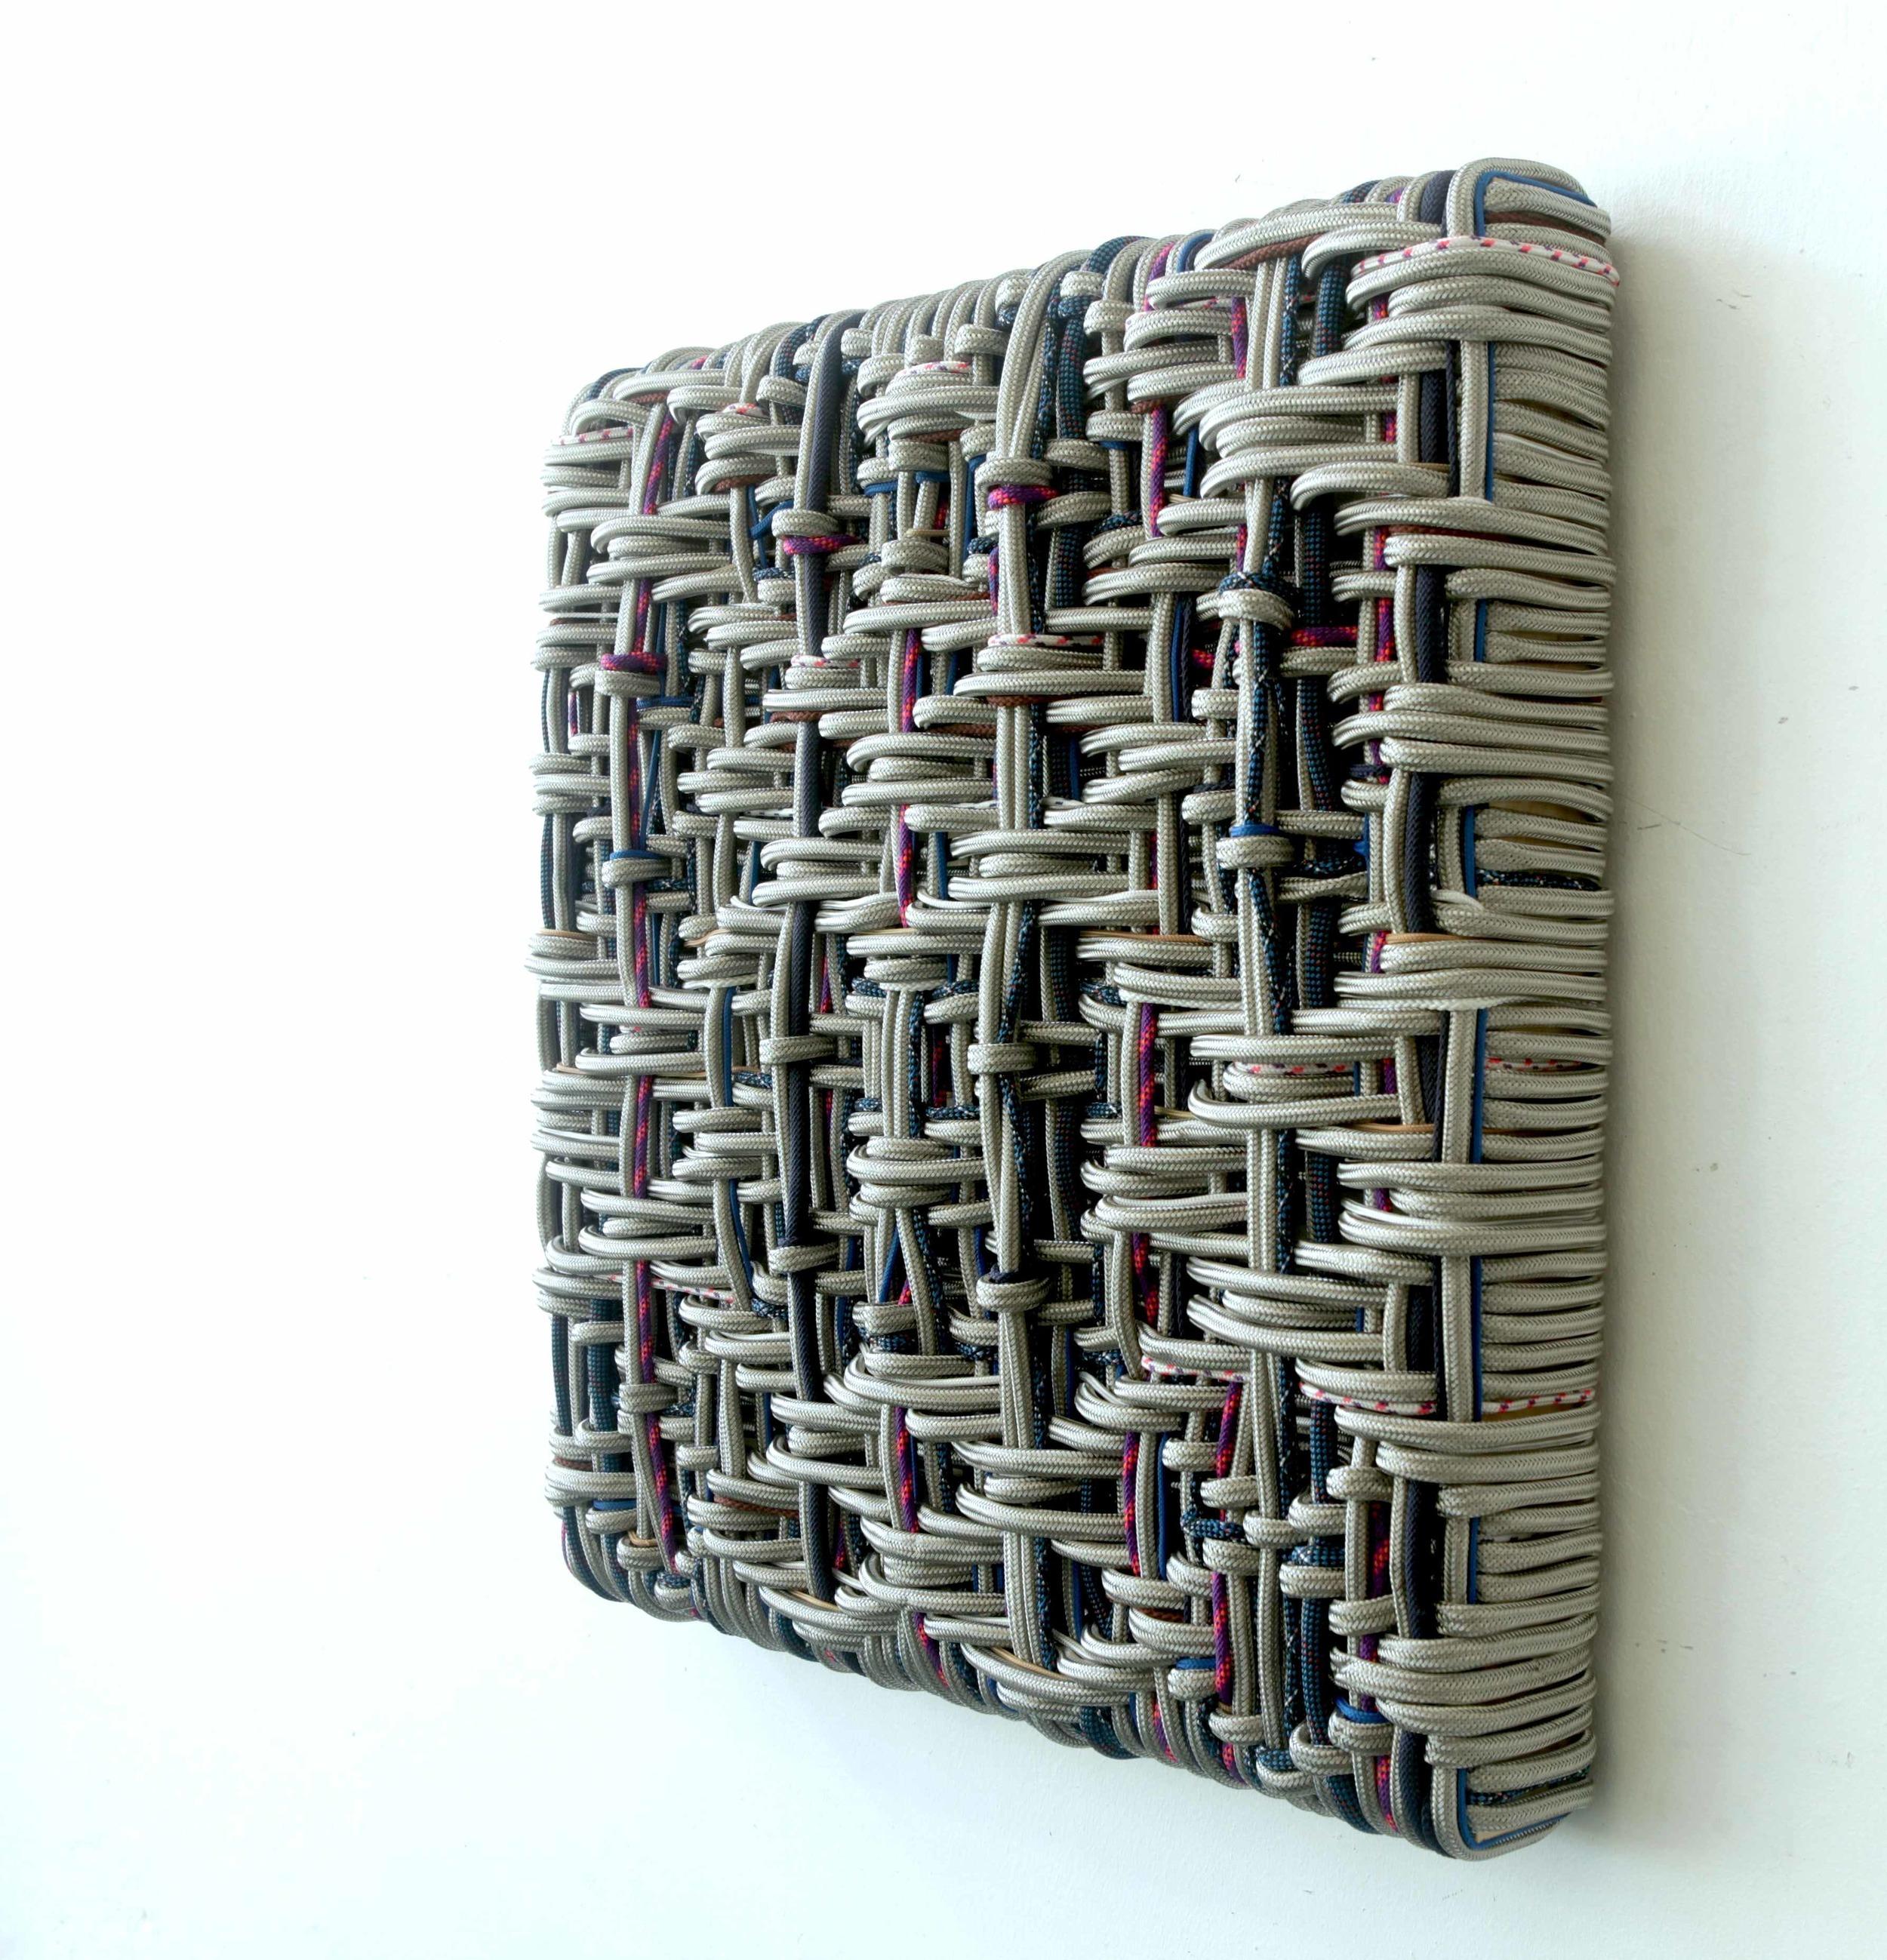 DANI MARTI    Shield    2013   65 x 65 cm   stainless steel , polyester, nylon on wood frame